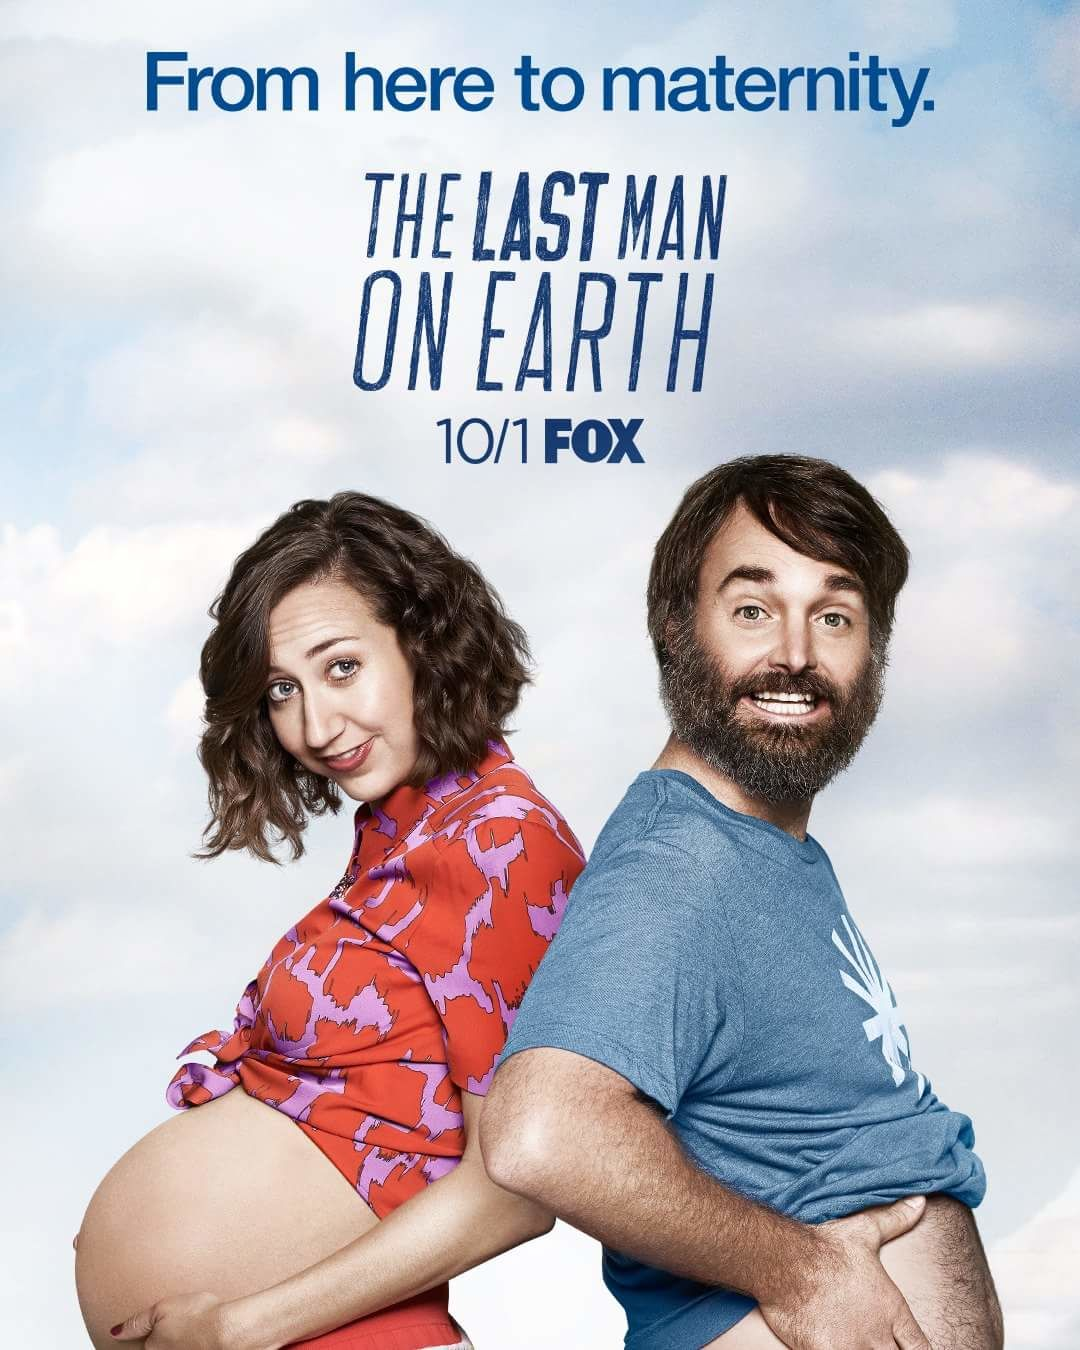 The Last Man on Earth teaser image